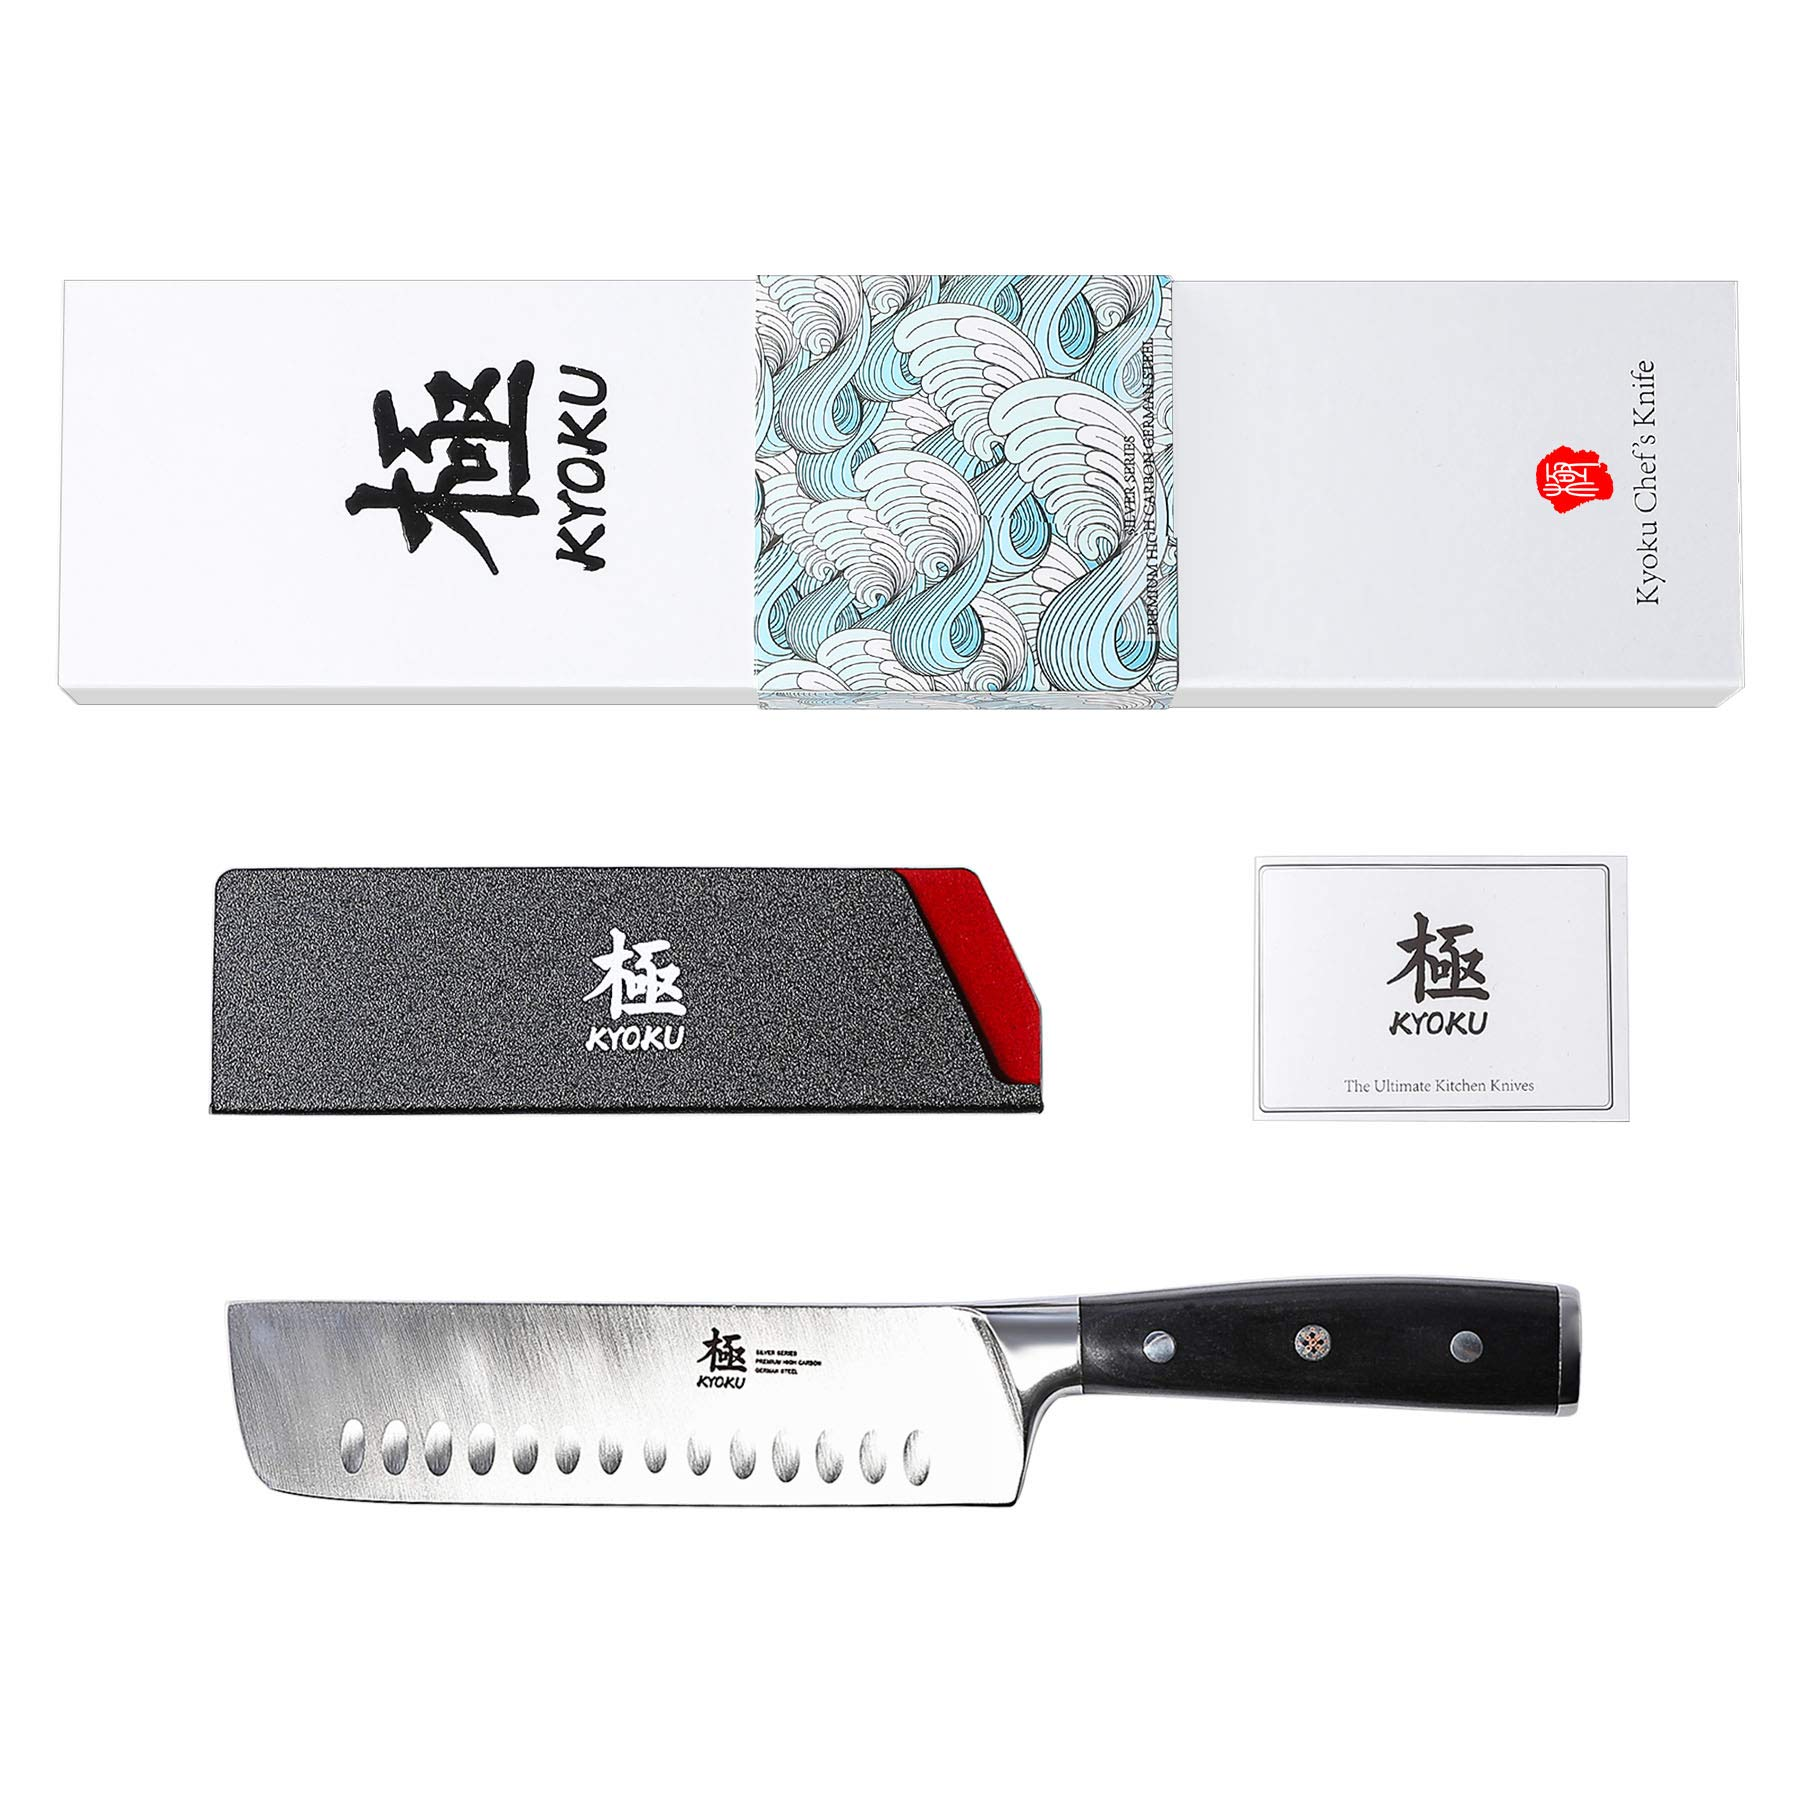 KYOKU Samurai Series - Nakiri Japanese Vegetable Knife 7'' with Sheath & Case - Full Tang - Japanese High Carbon Steel - Pakkawood Handle with Mosaic Pin by KYOKU (Image #6)